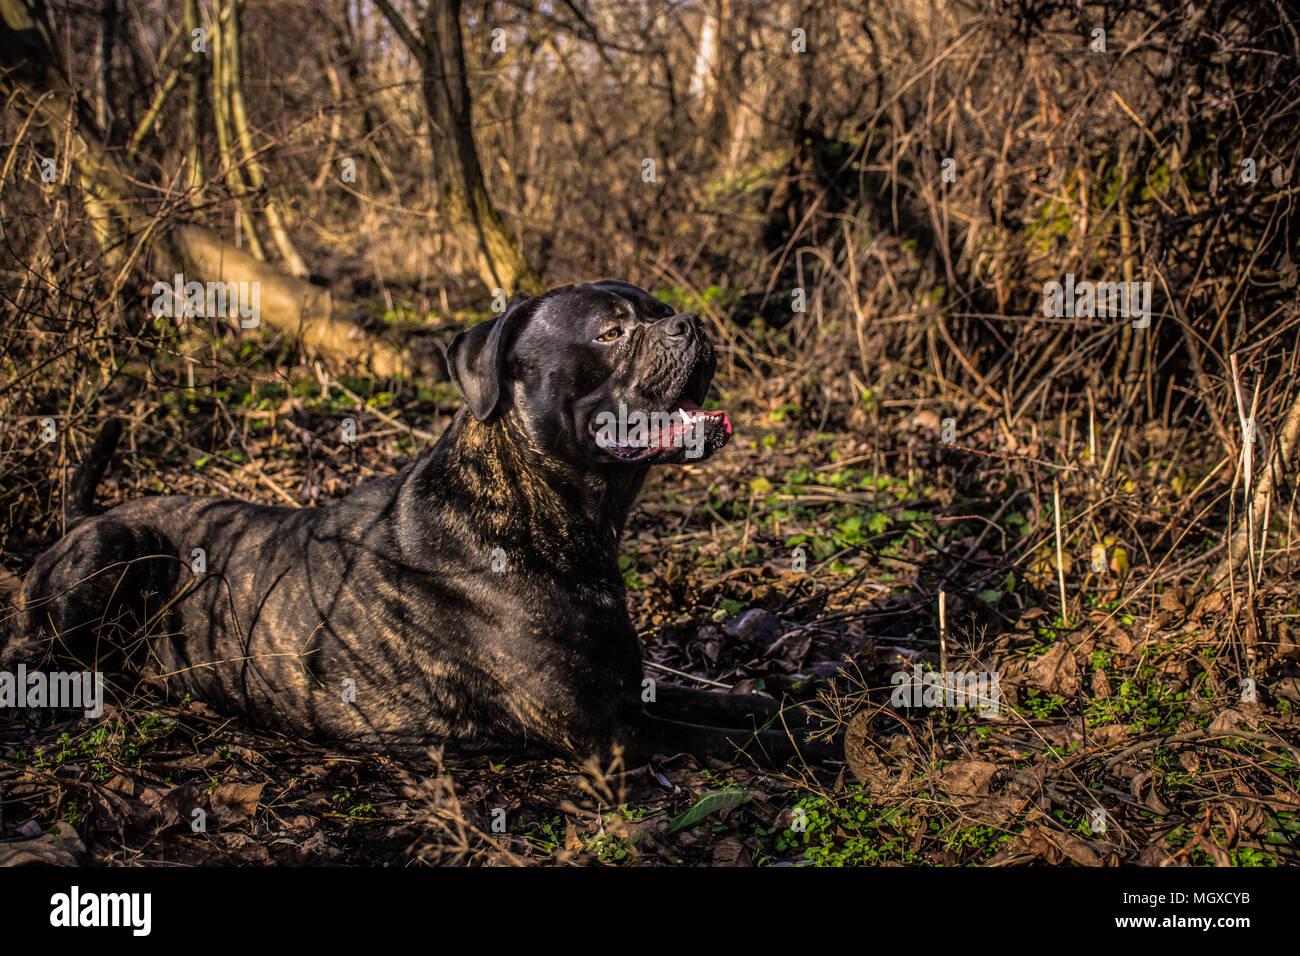 Big Black Dog Cane Corso Italian Mastiff Lying Down And Resting In